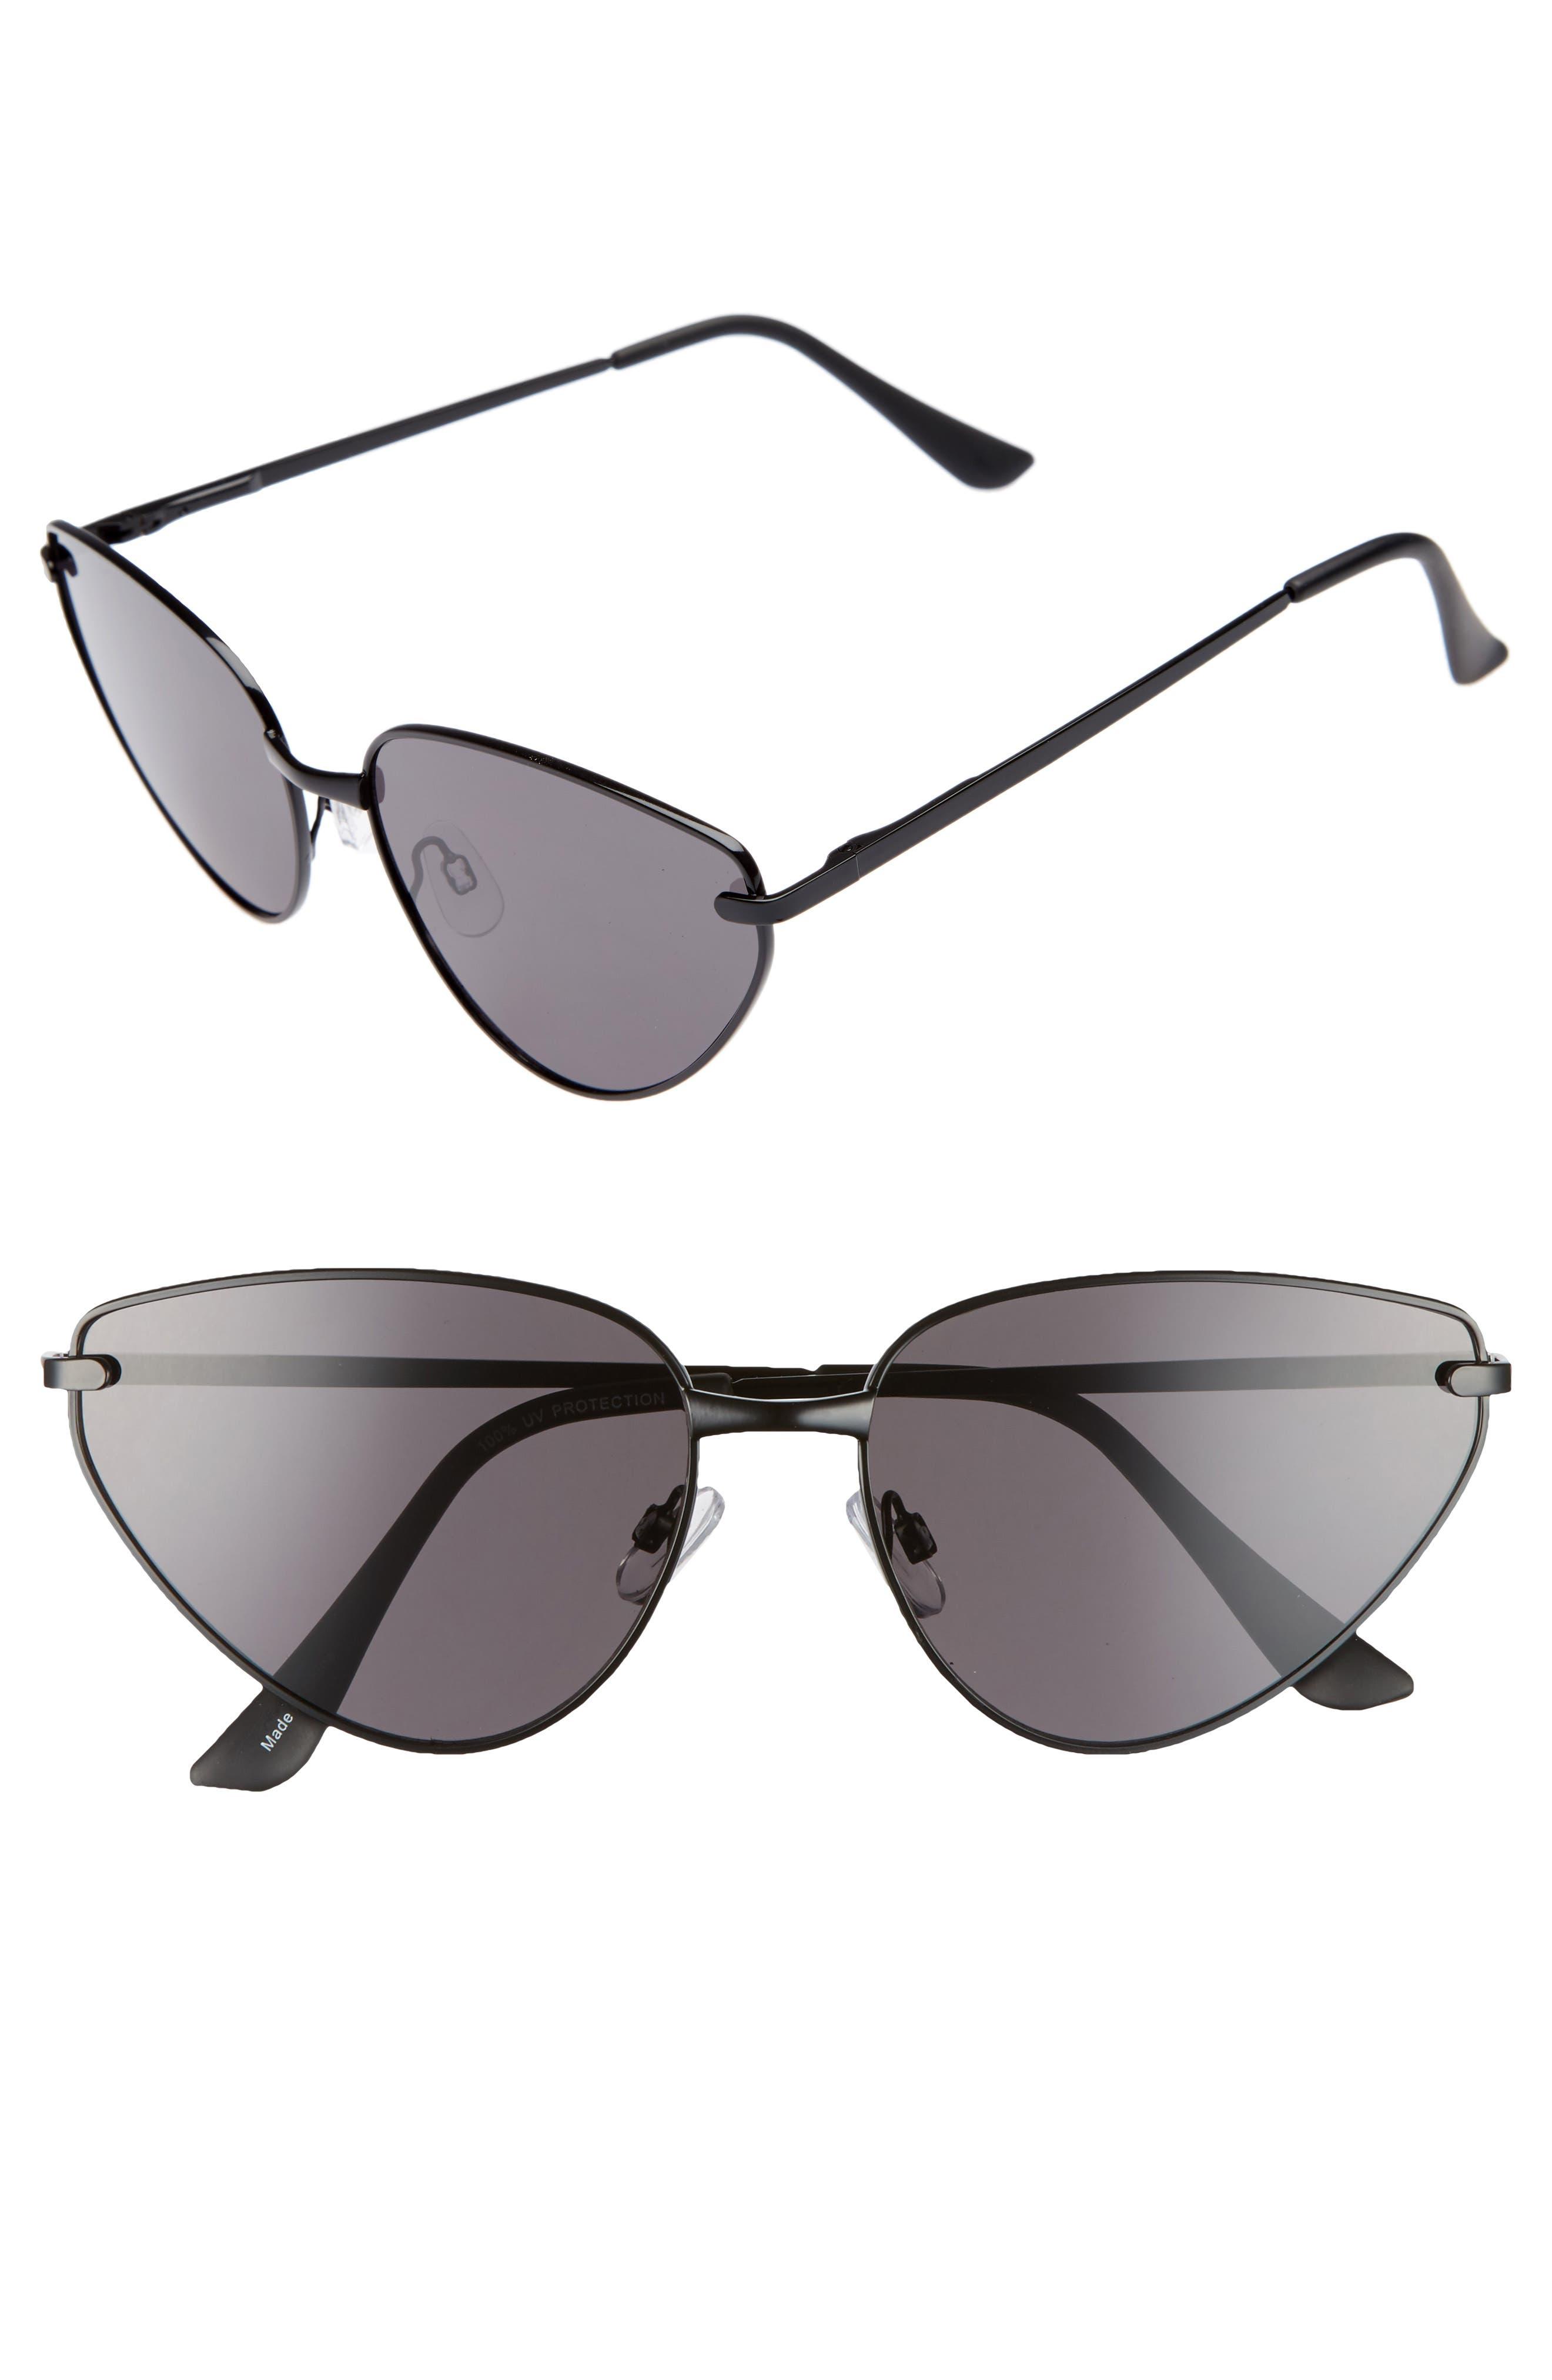 Alternate Image 1 Selected - BP. 60mm Exaggerated Cat Eye Sunglasses